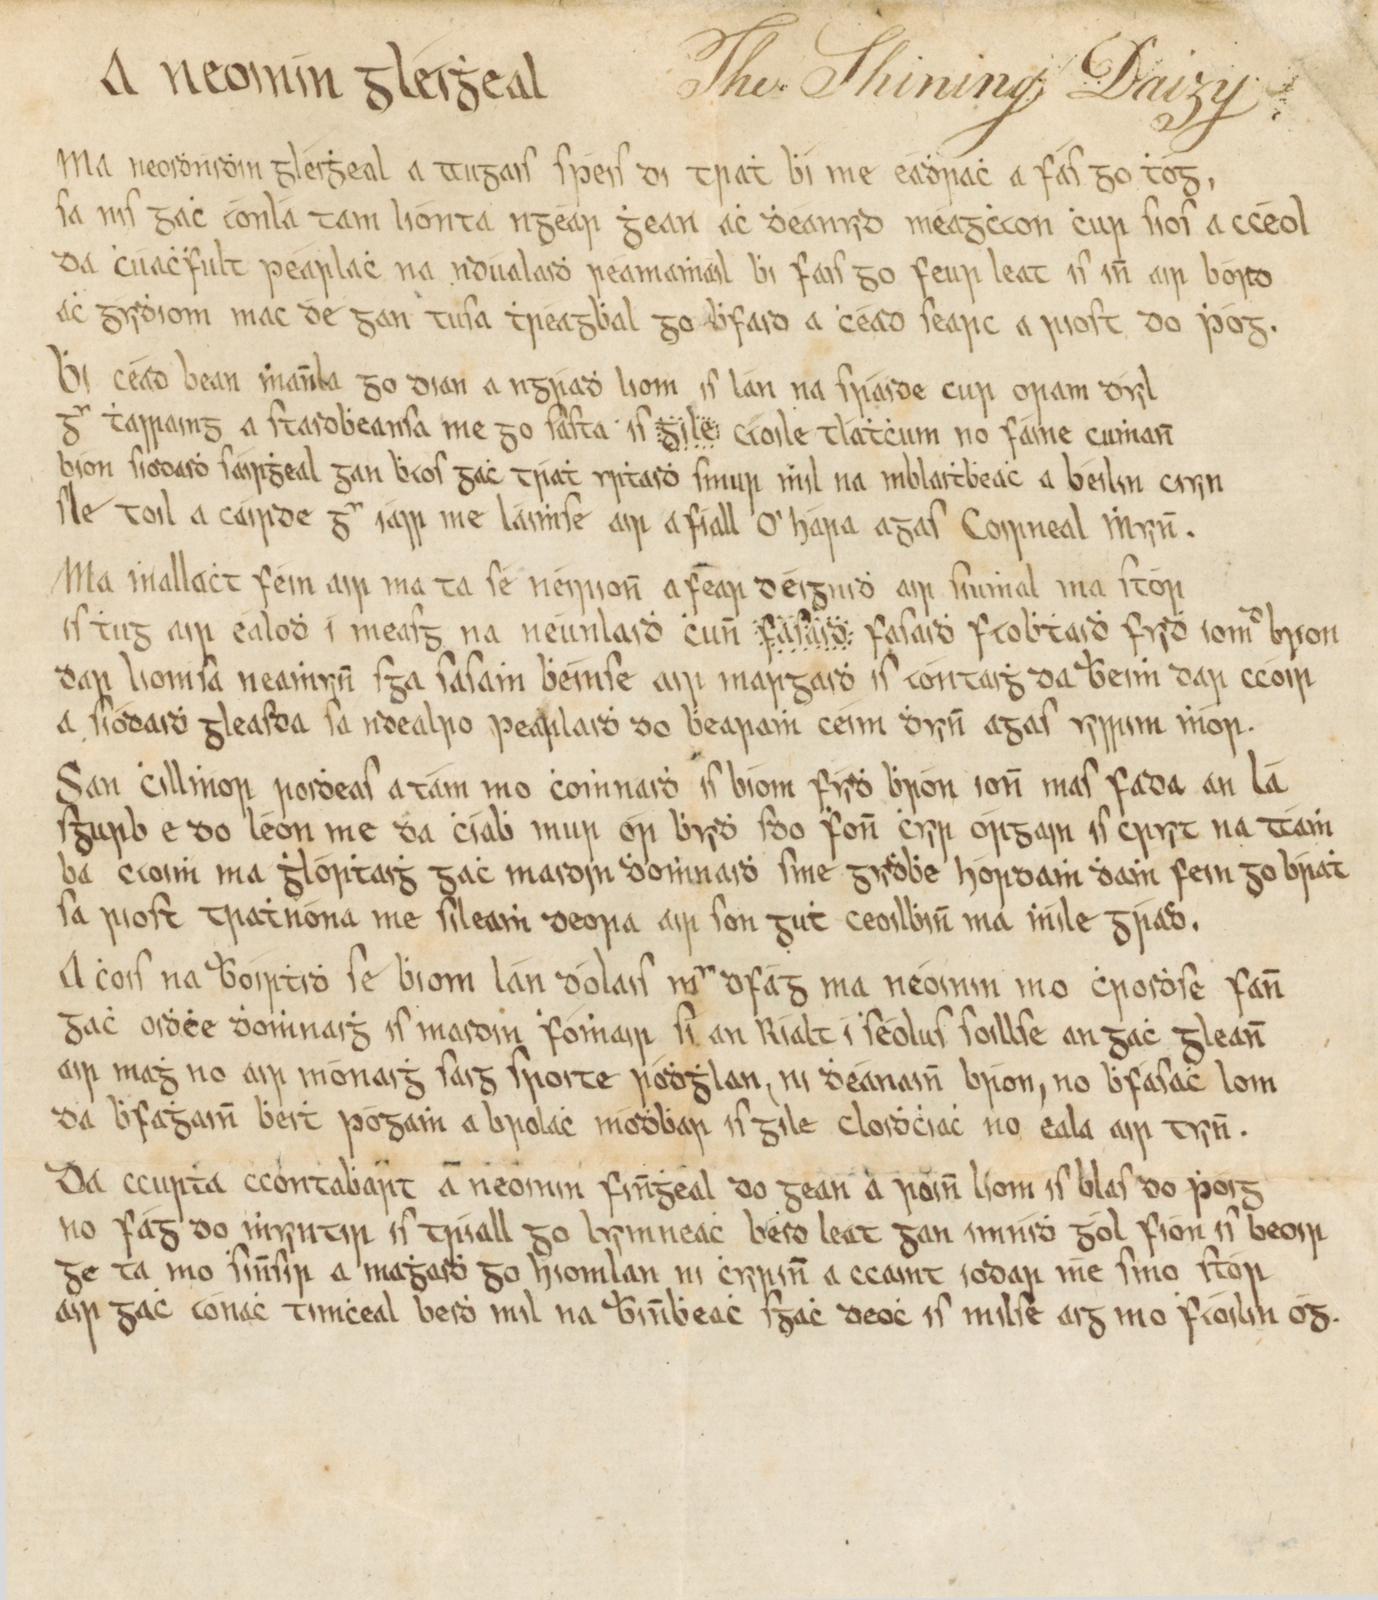 MS 4/26, Collections of songs in Irish, and memoranda